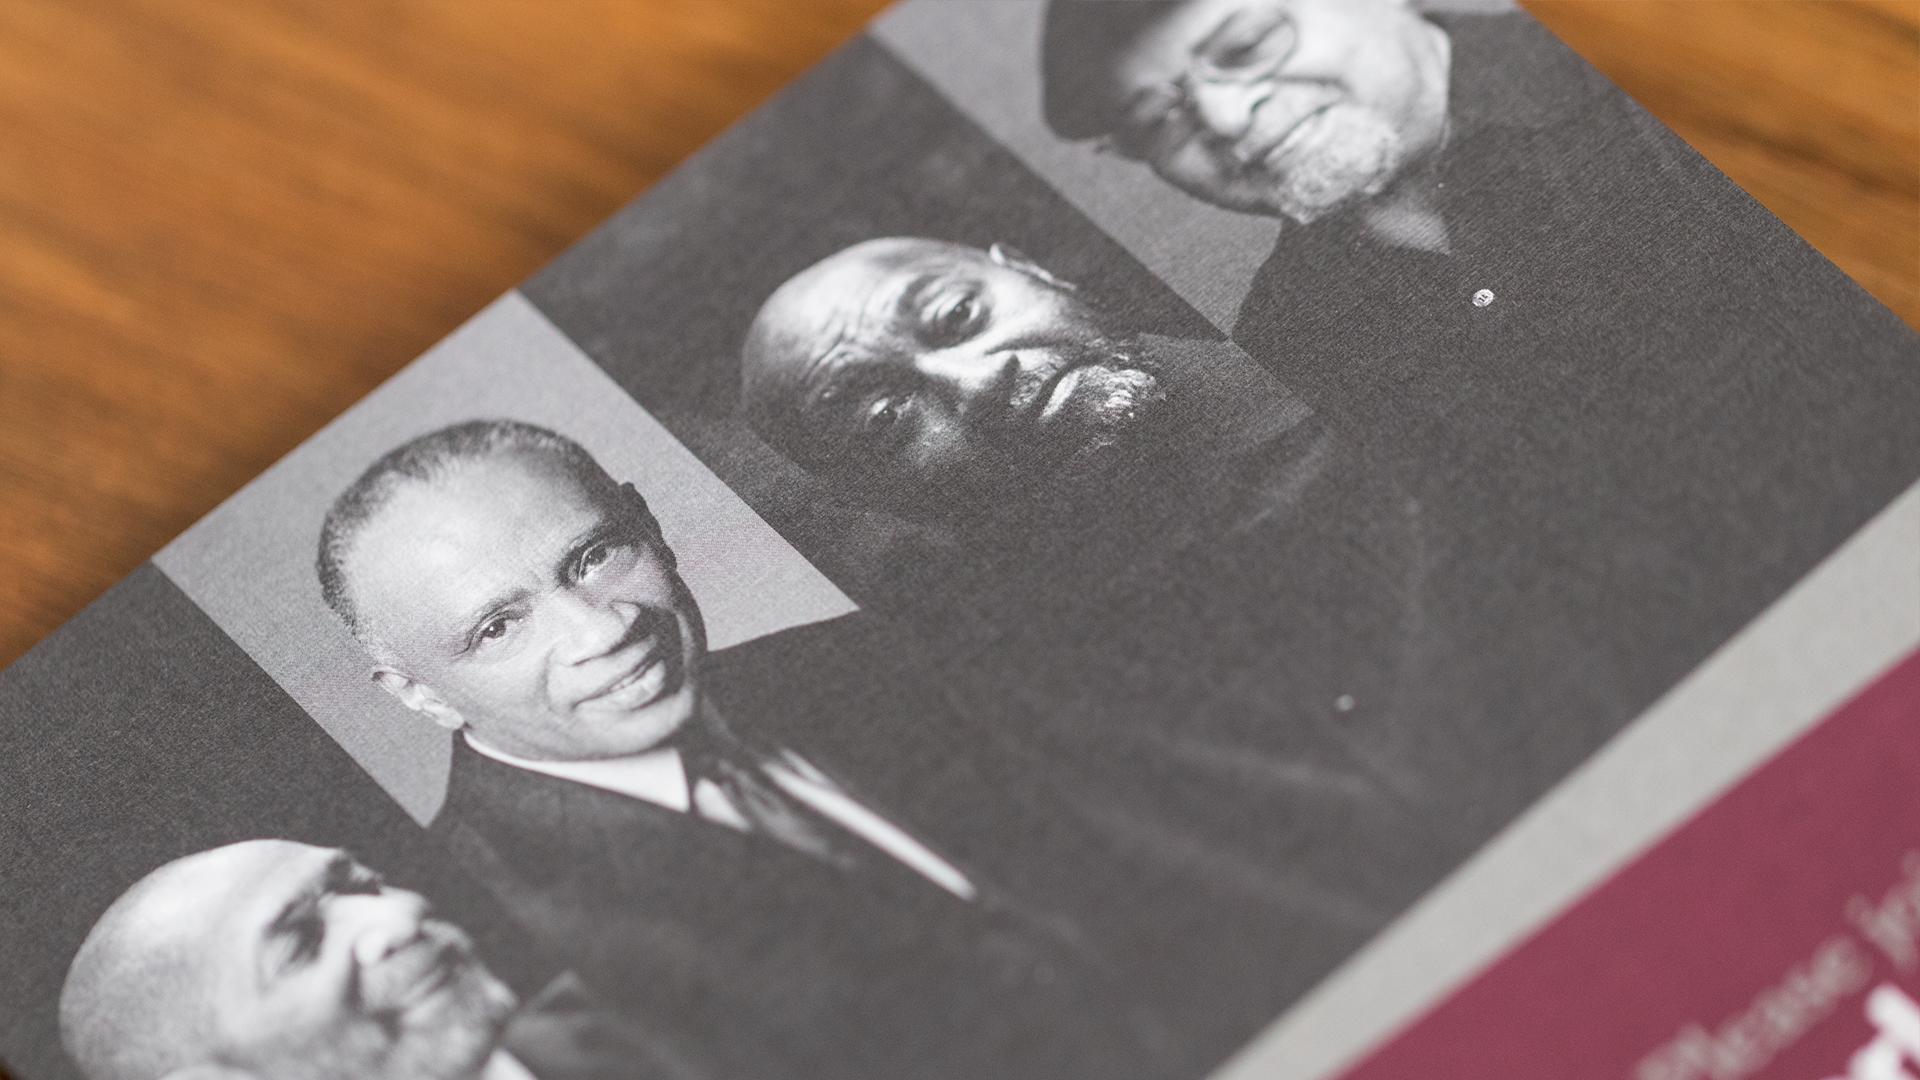 Print – Invitation Packet – Invite Cover (Artist Photos Close-Up)